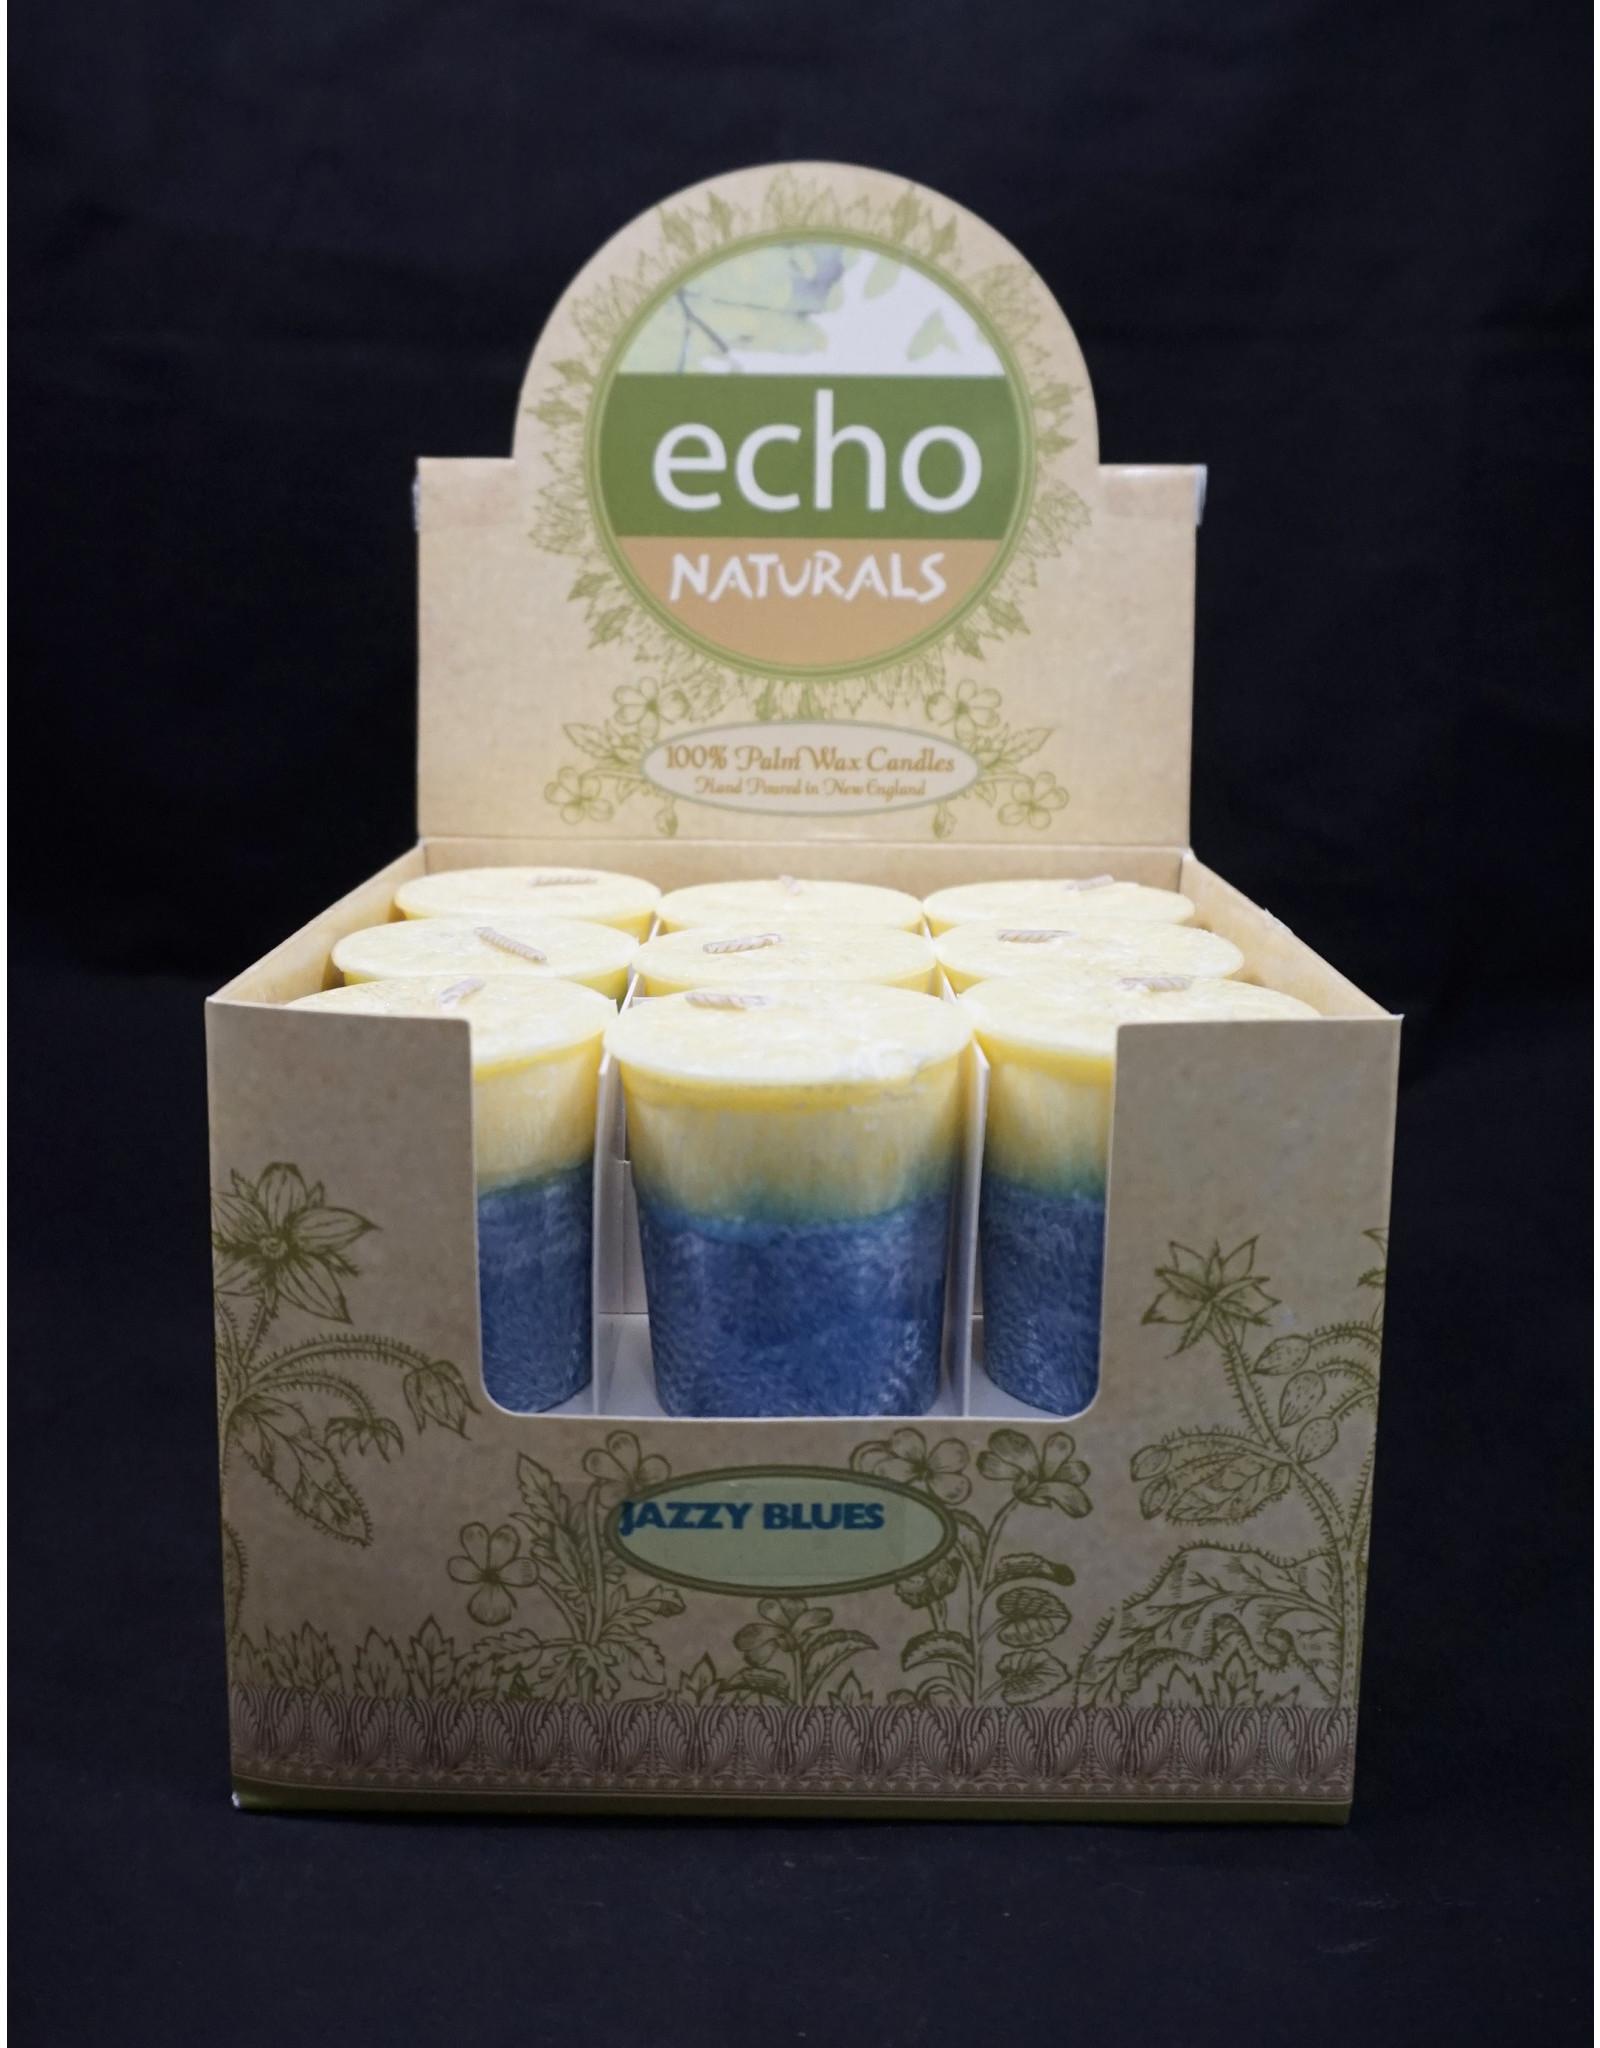 Echo Naturals Votive Candle -Jazzy Blues